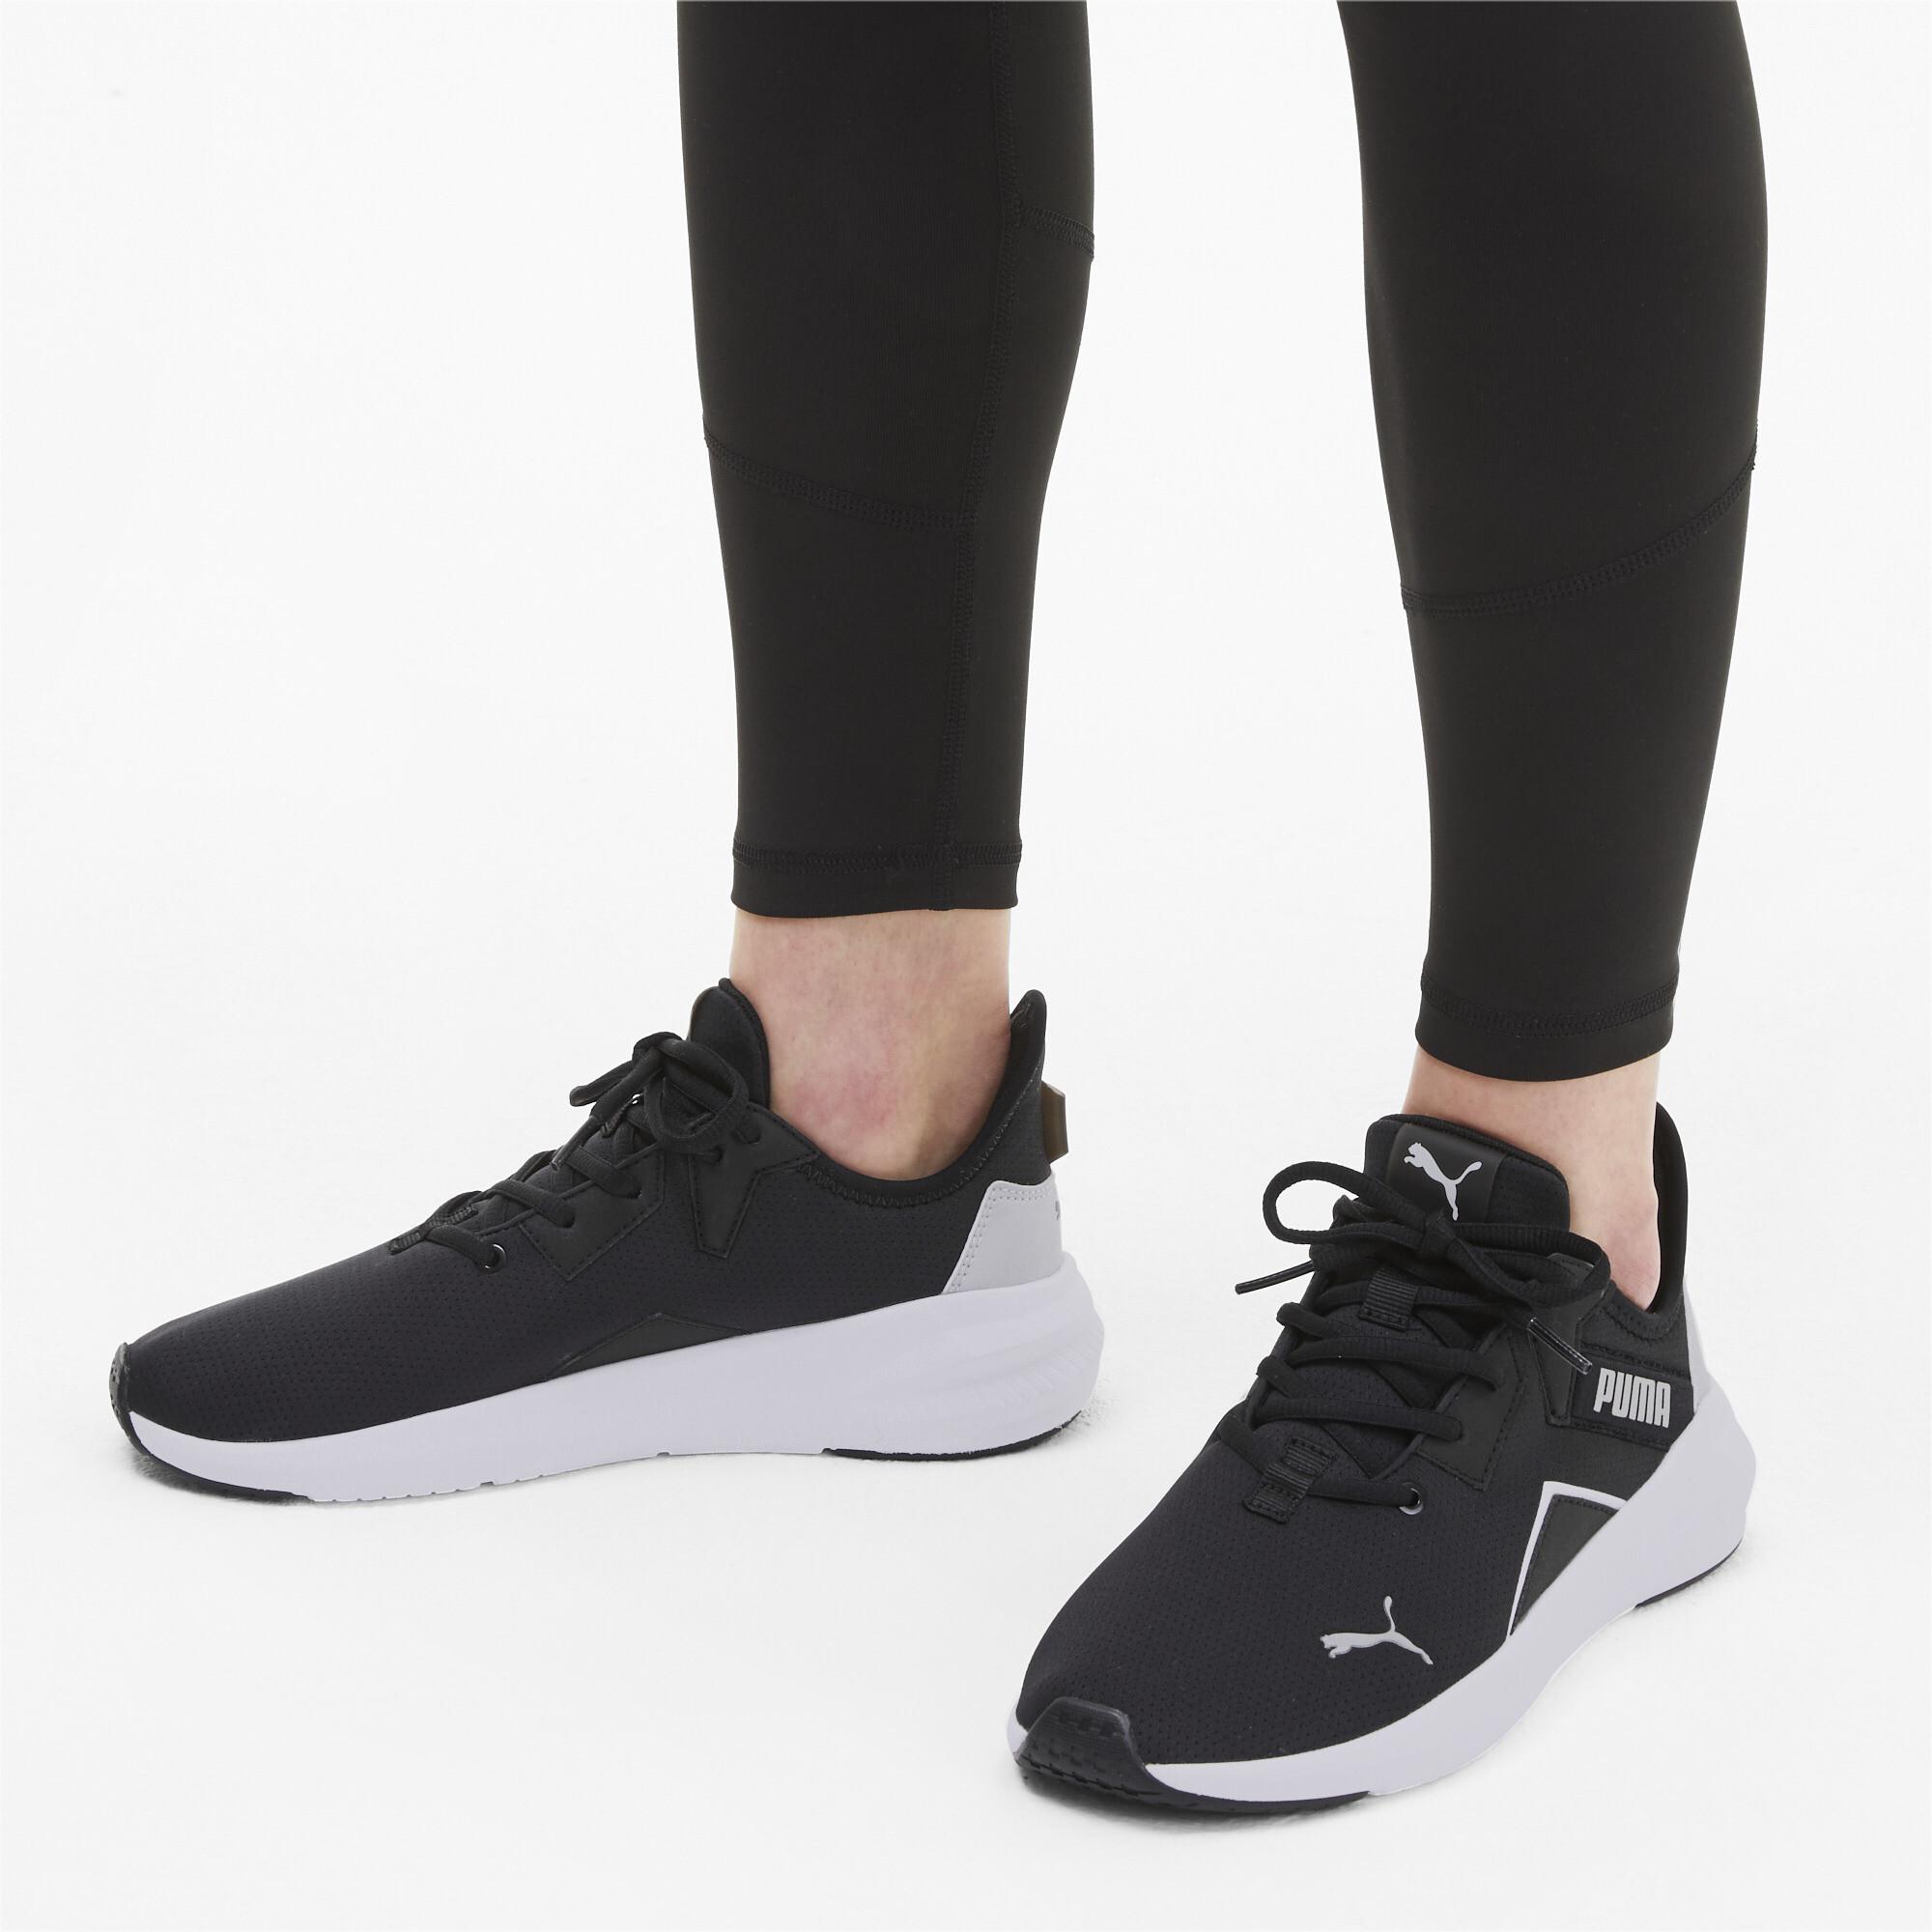 thumbnail 19 - PUMA-Women-039-s-Platinum-Training-Shoes